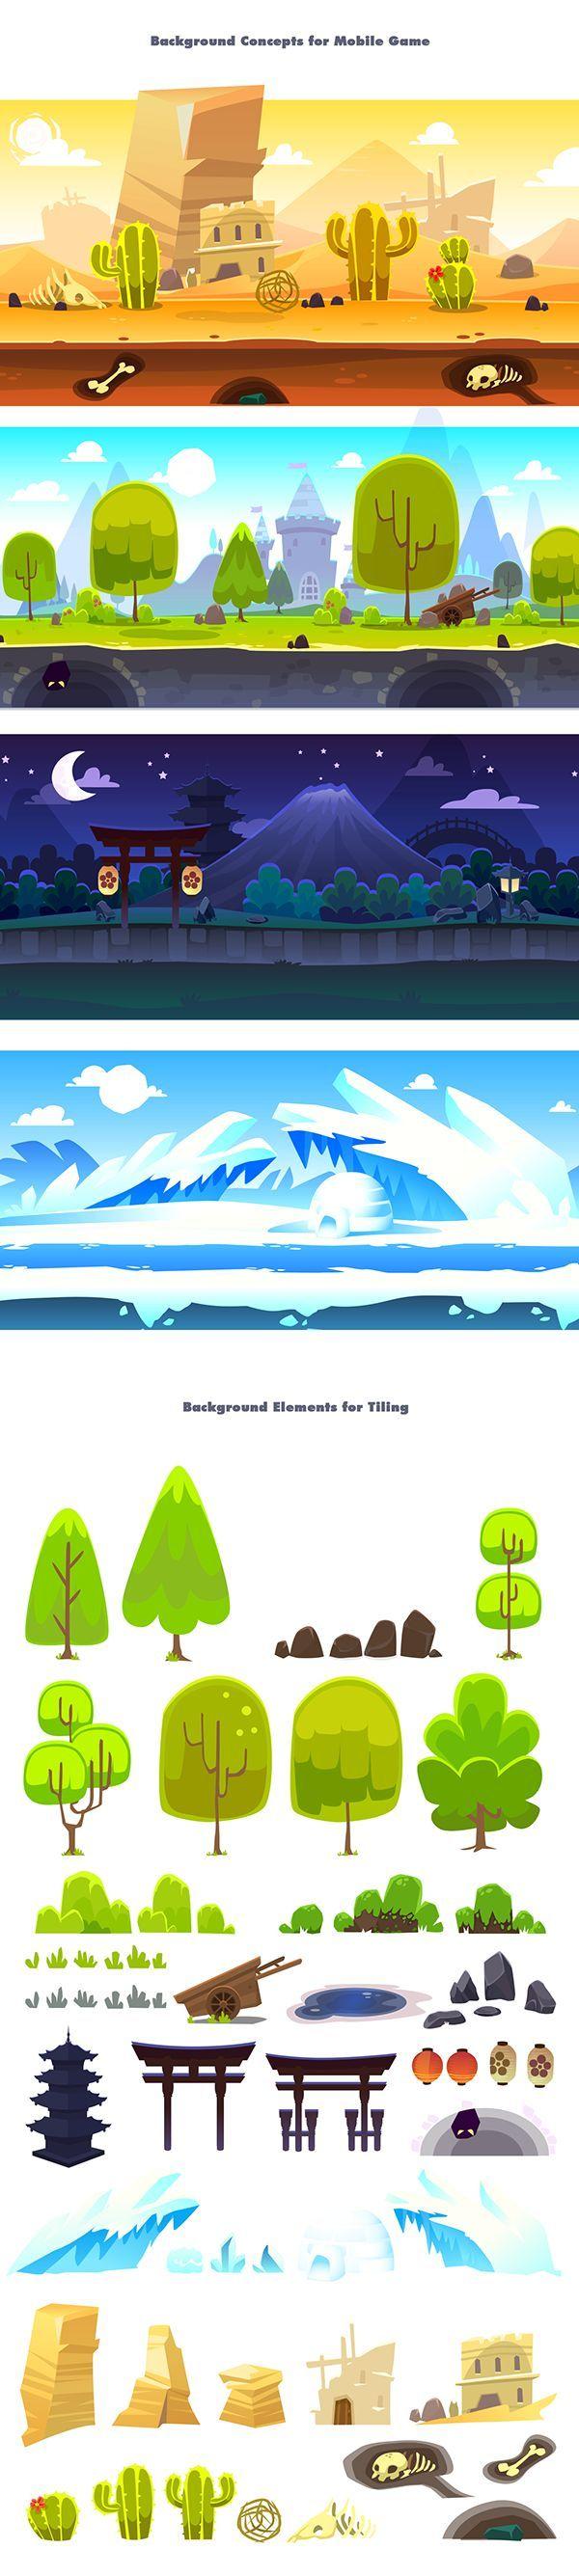 https://www.behance.net/gallery/23400027/Misc-Background-Concepts